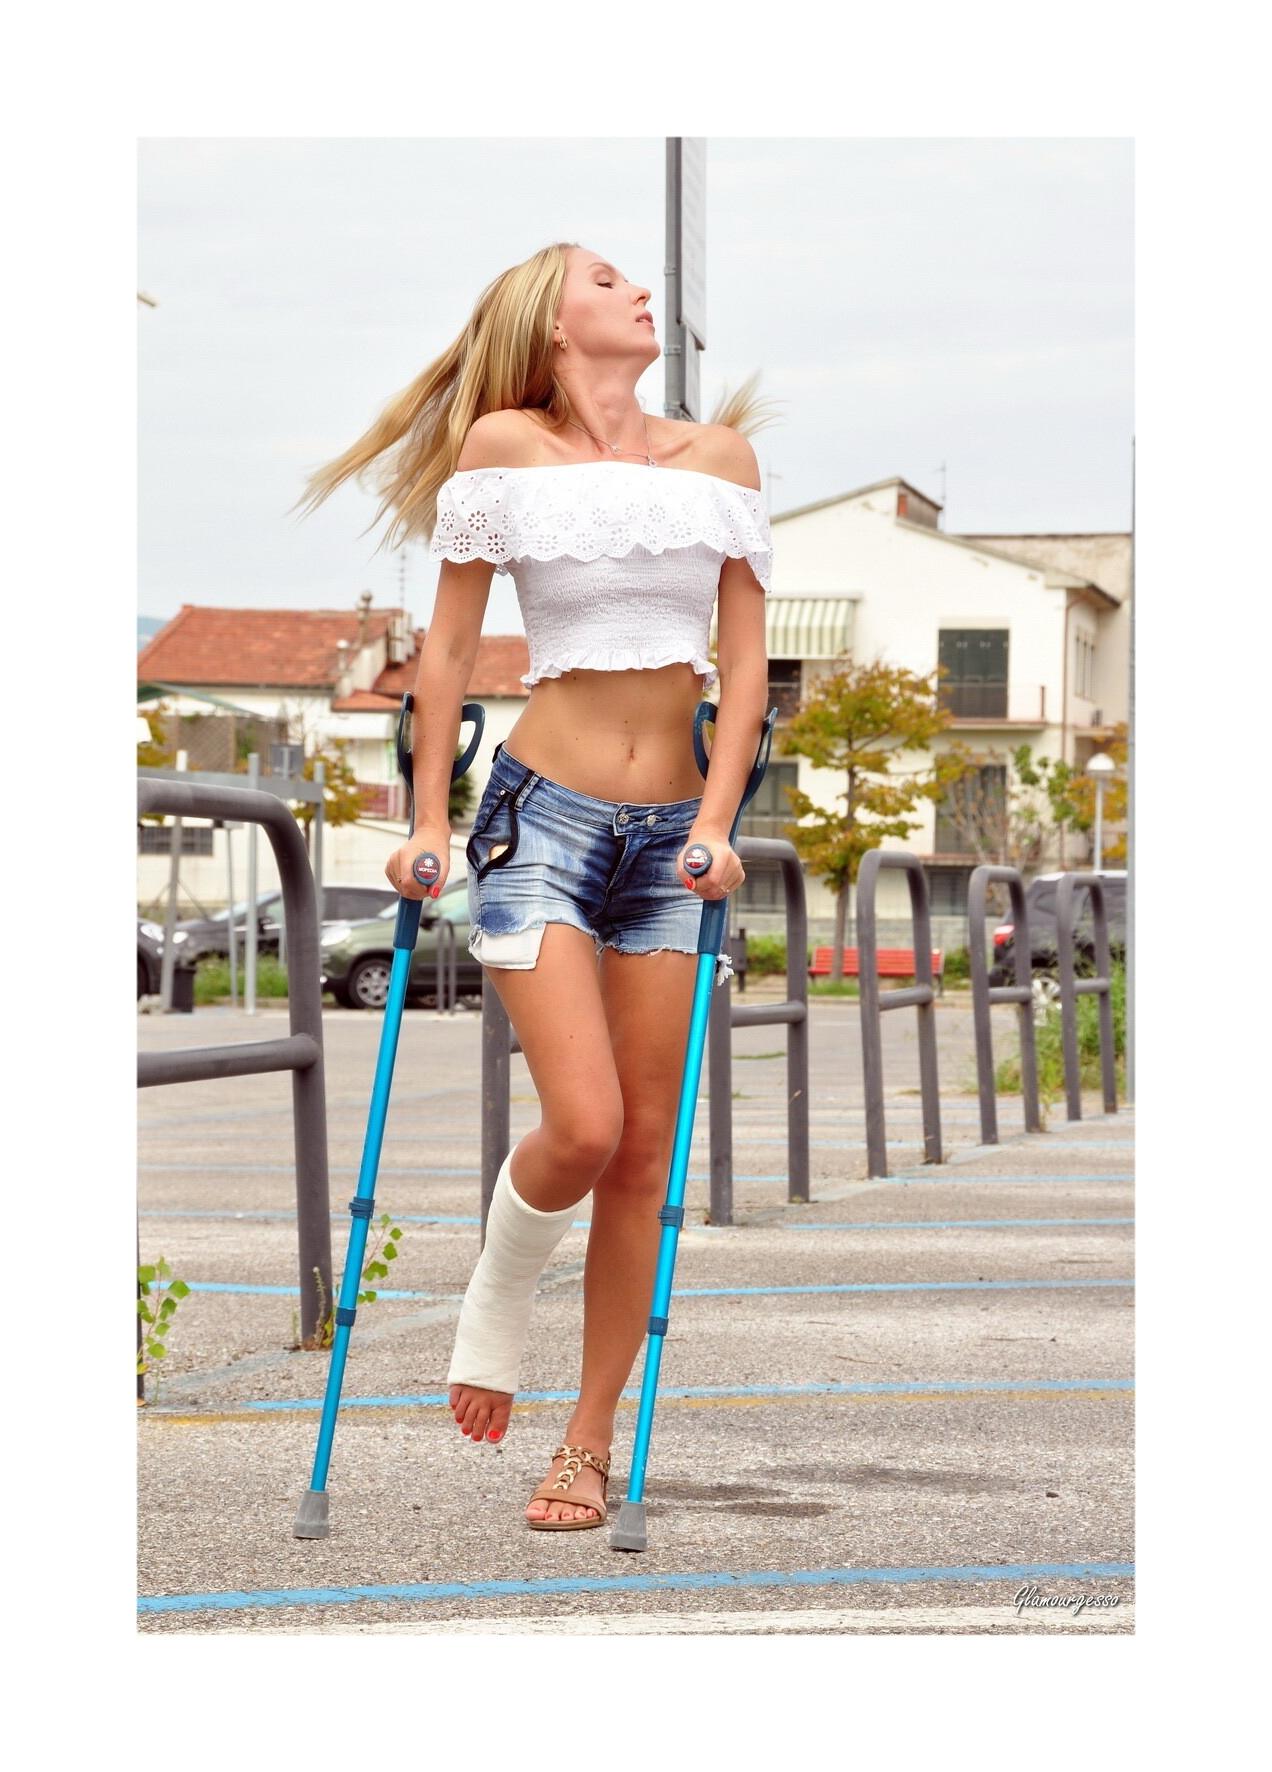 SVITLANA 5-DAYS SLC - Ukrainian professional model Svitlana wears her Long-Term SLC, showing you her attitude on crutches in variuos feminine outfits.